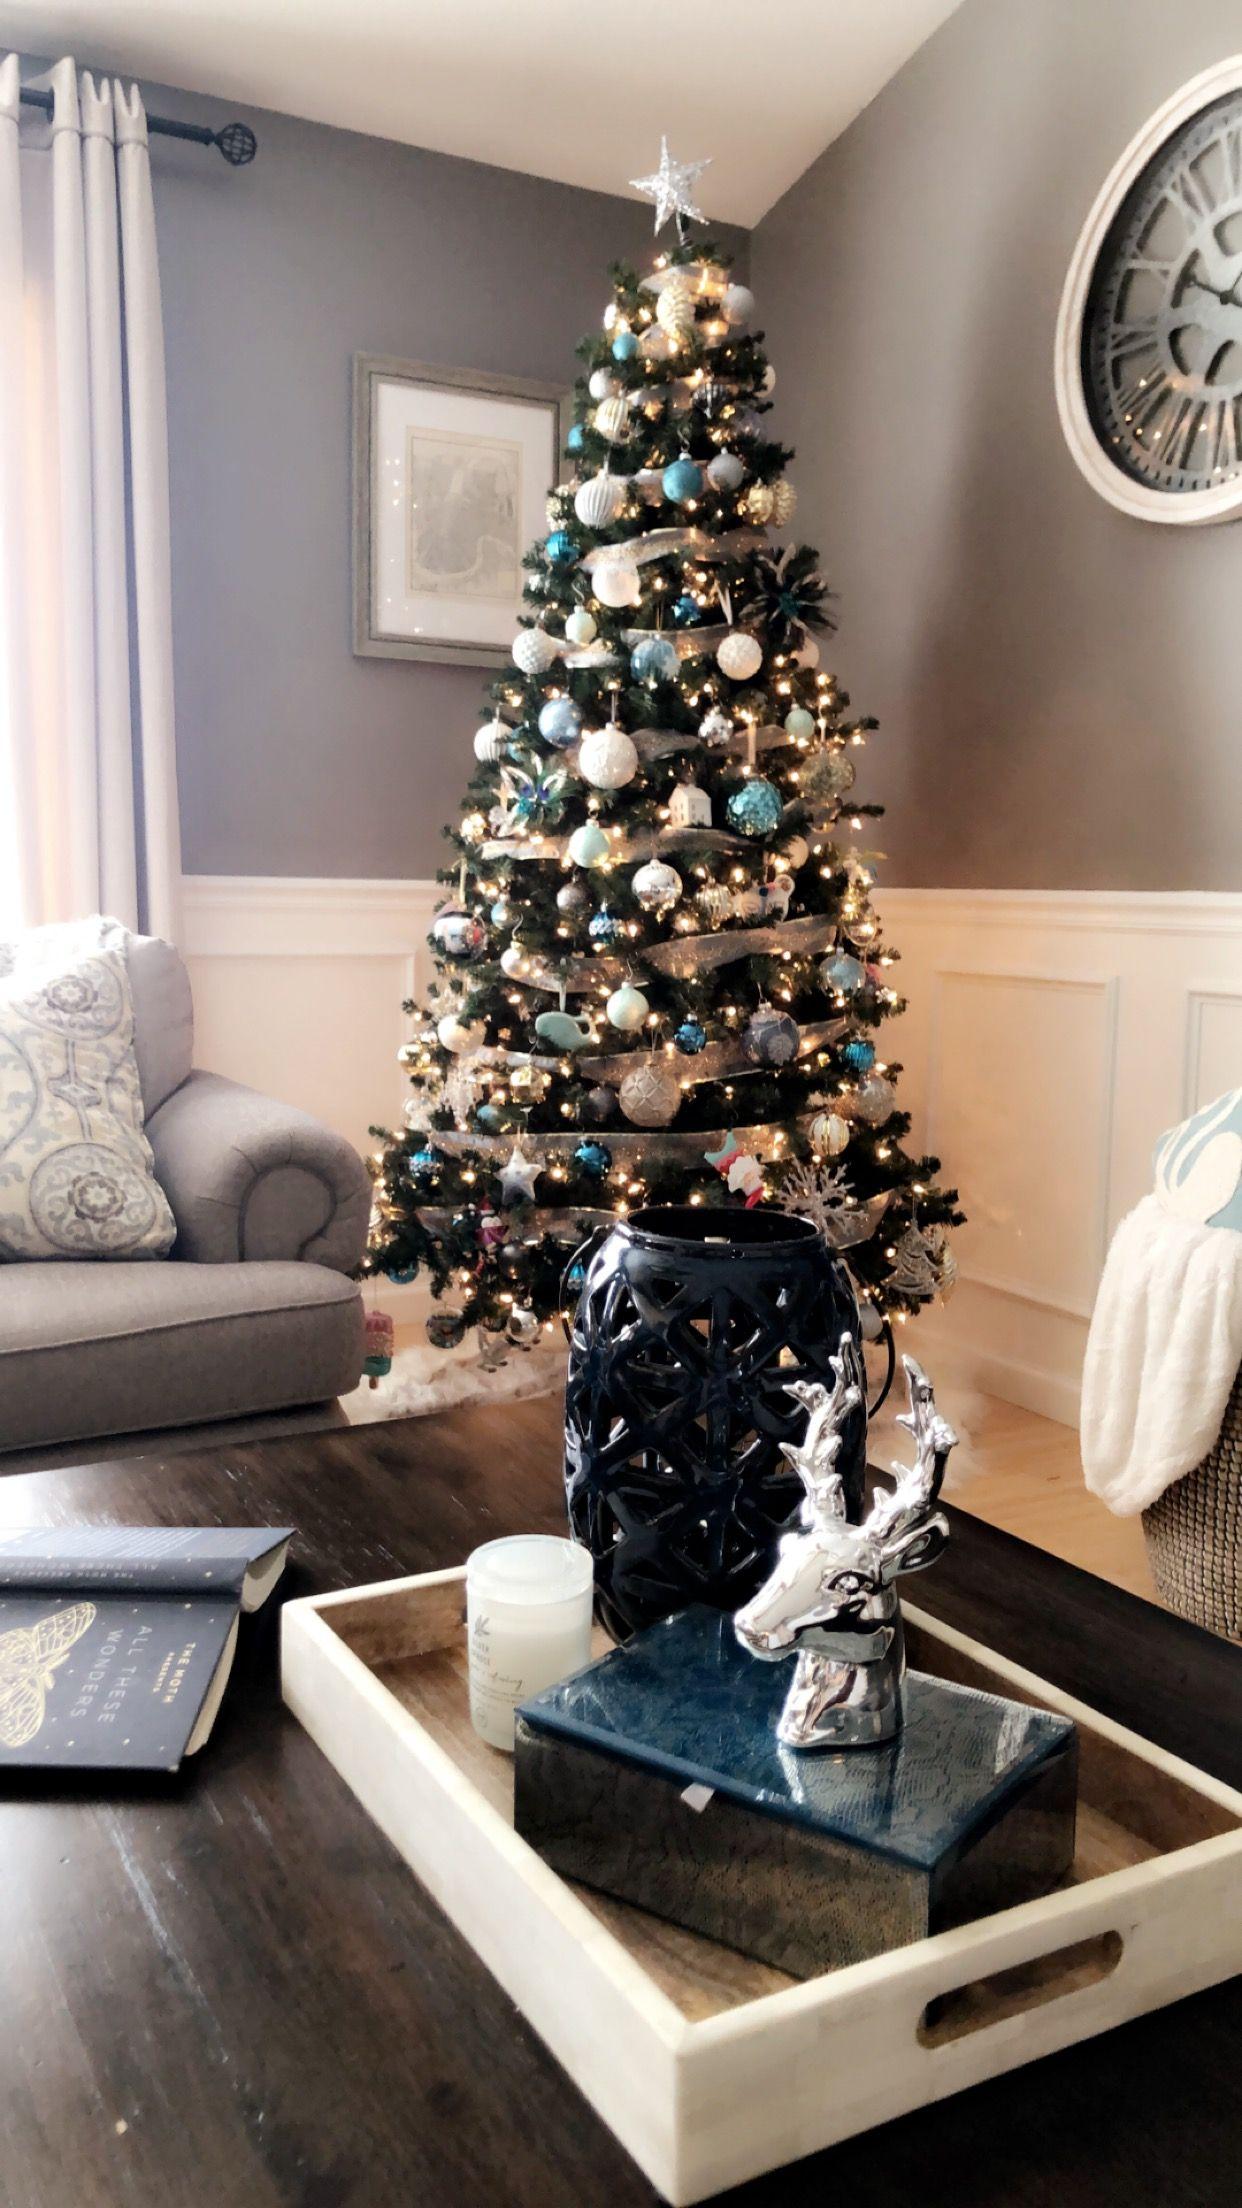 Christmas Silver Blue Living Room Blue Living Room Silver Christmas Decorations Christmas Decorations Living Room #silver #and #blue #living #room